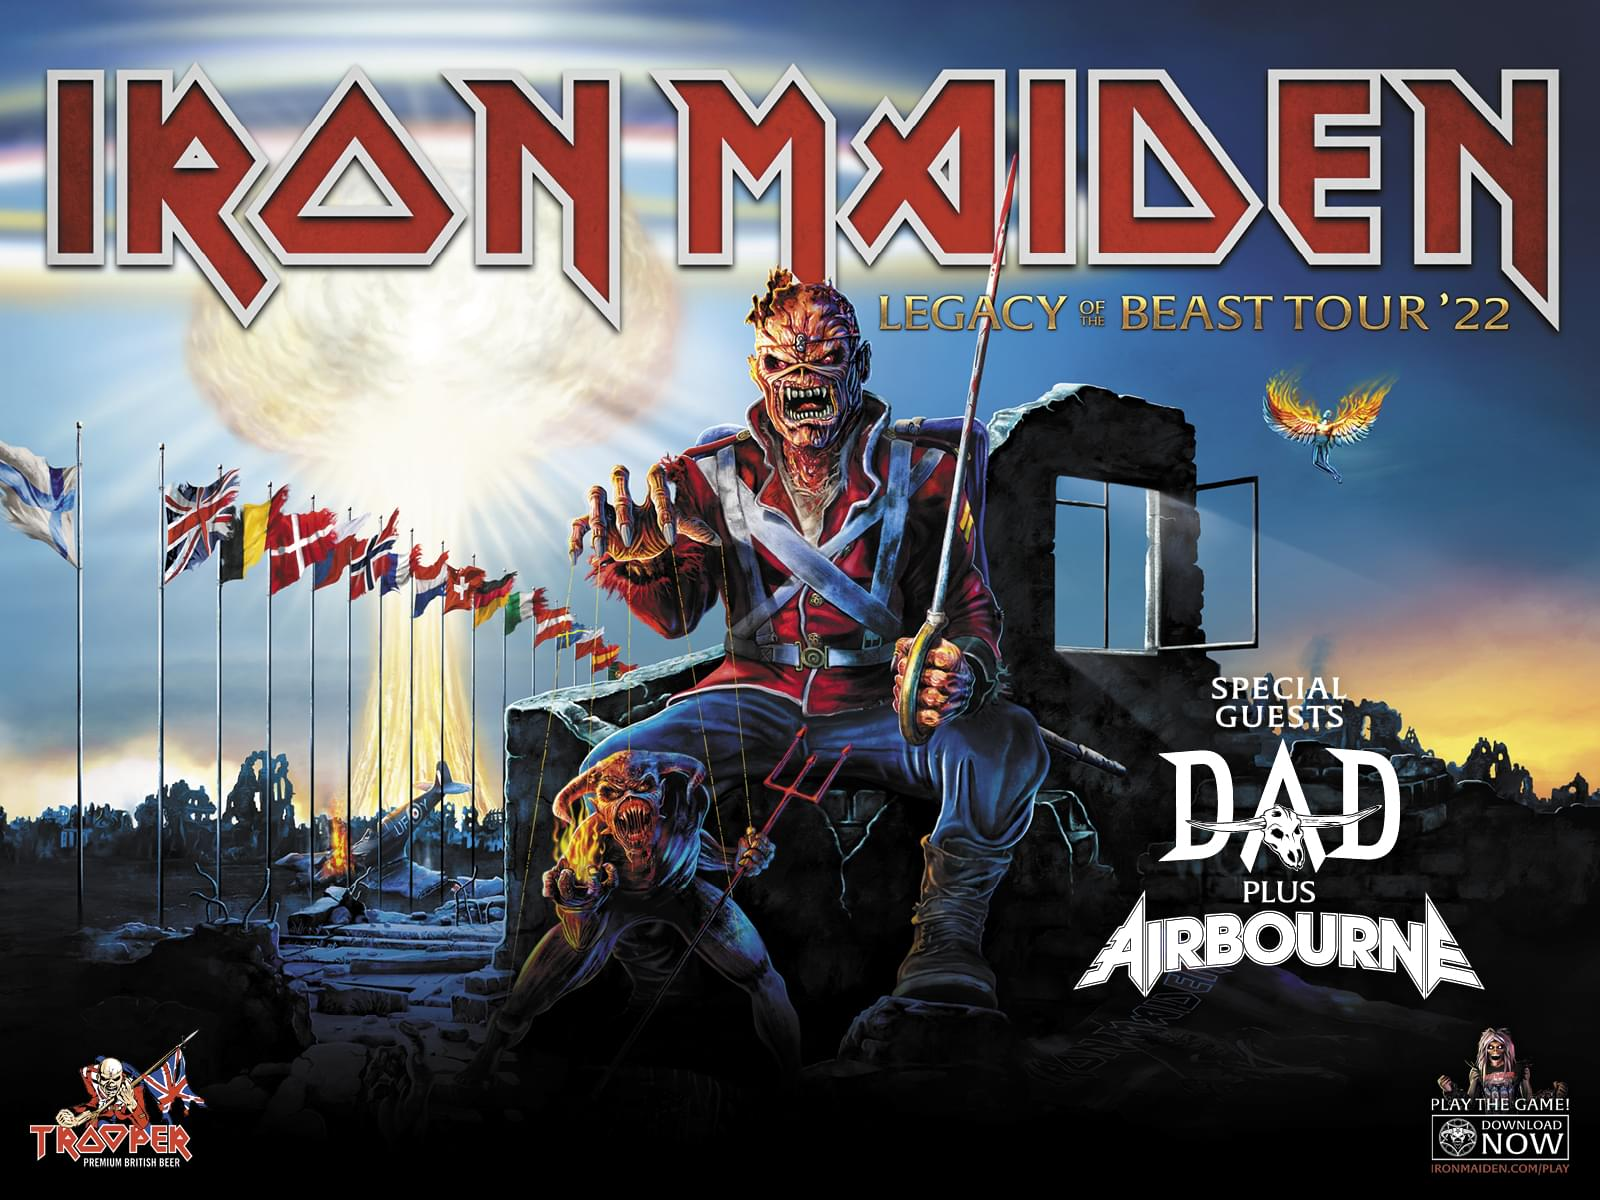 Iron Maiden. Legacy of the beast tour 2022.